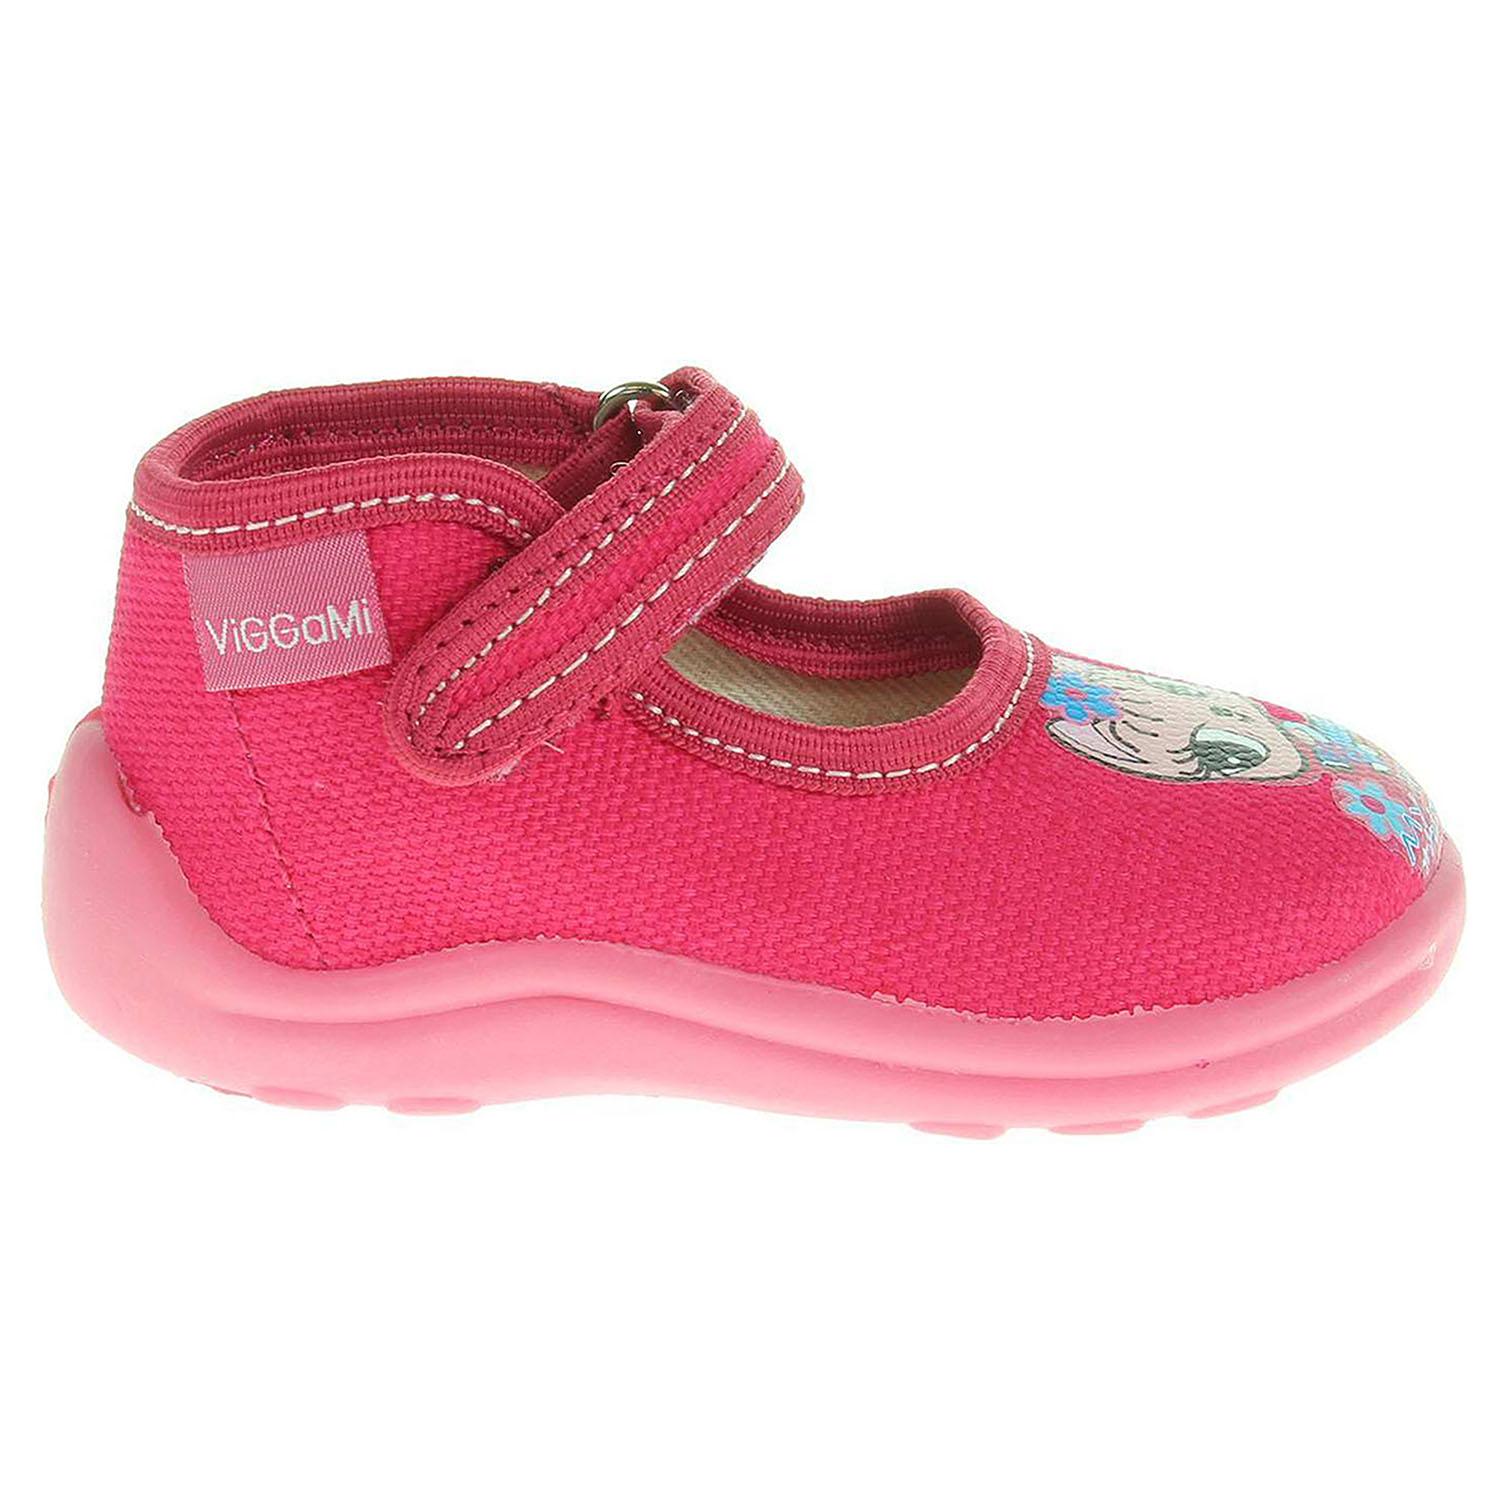 Ecco Rogallo dívčí bačkory D-132 růžové 26900172 caef0c1731